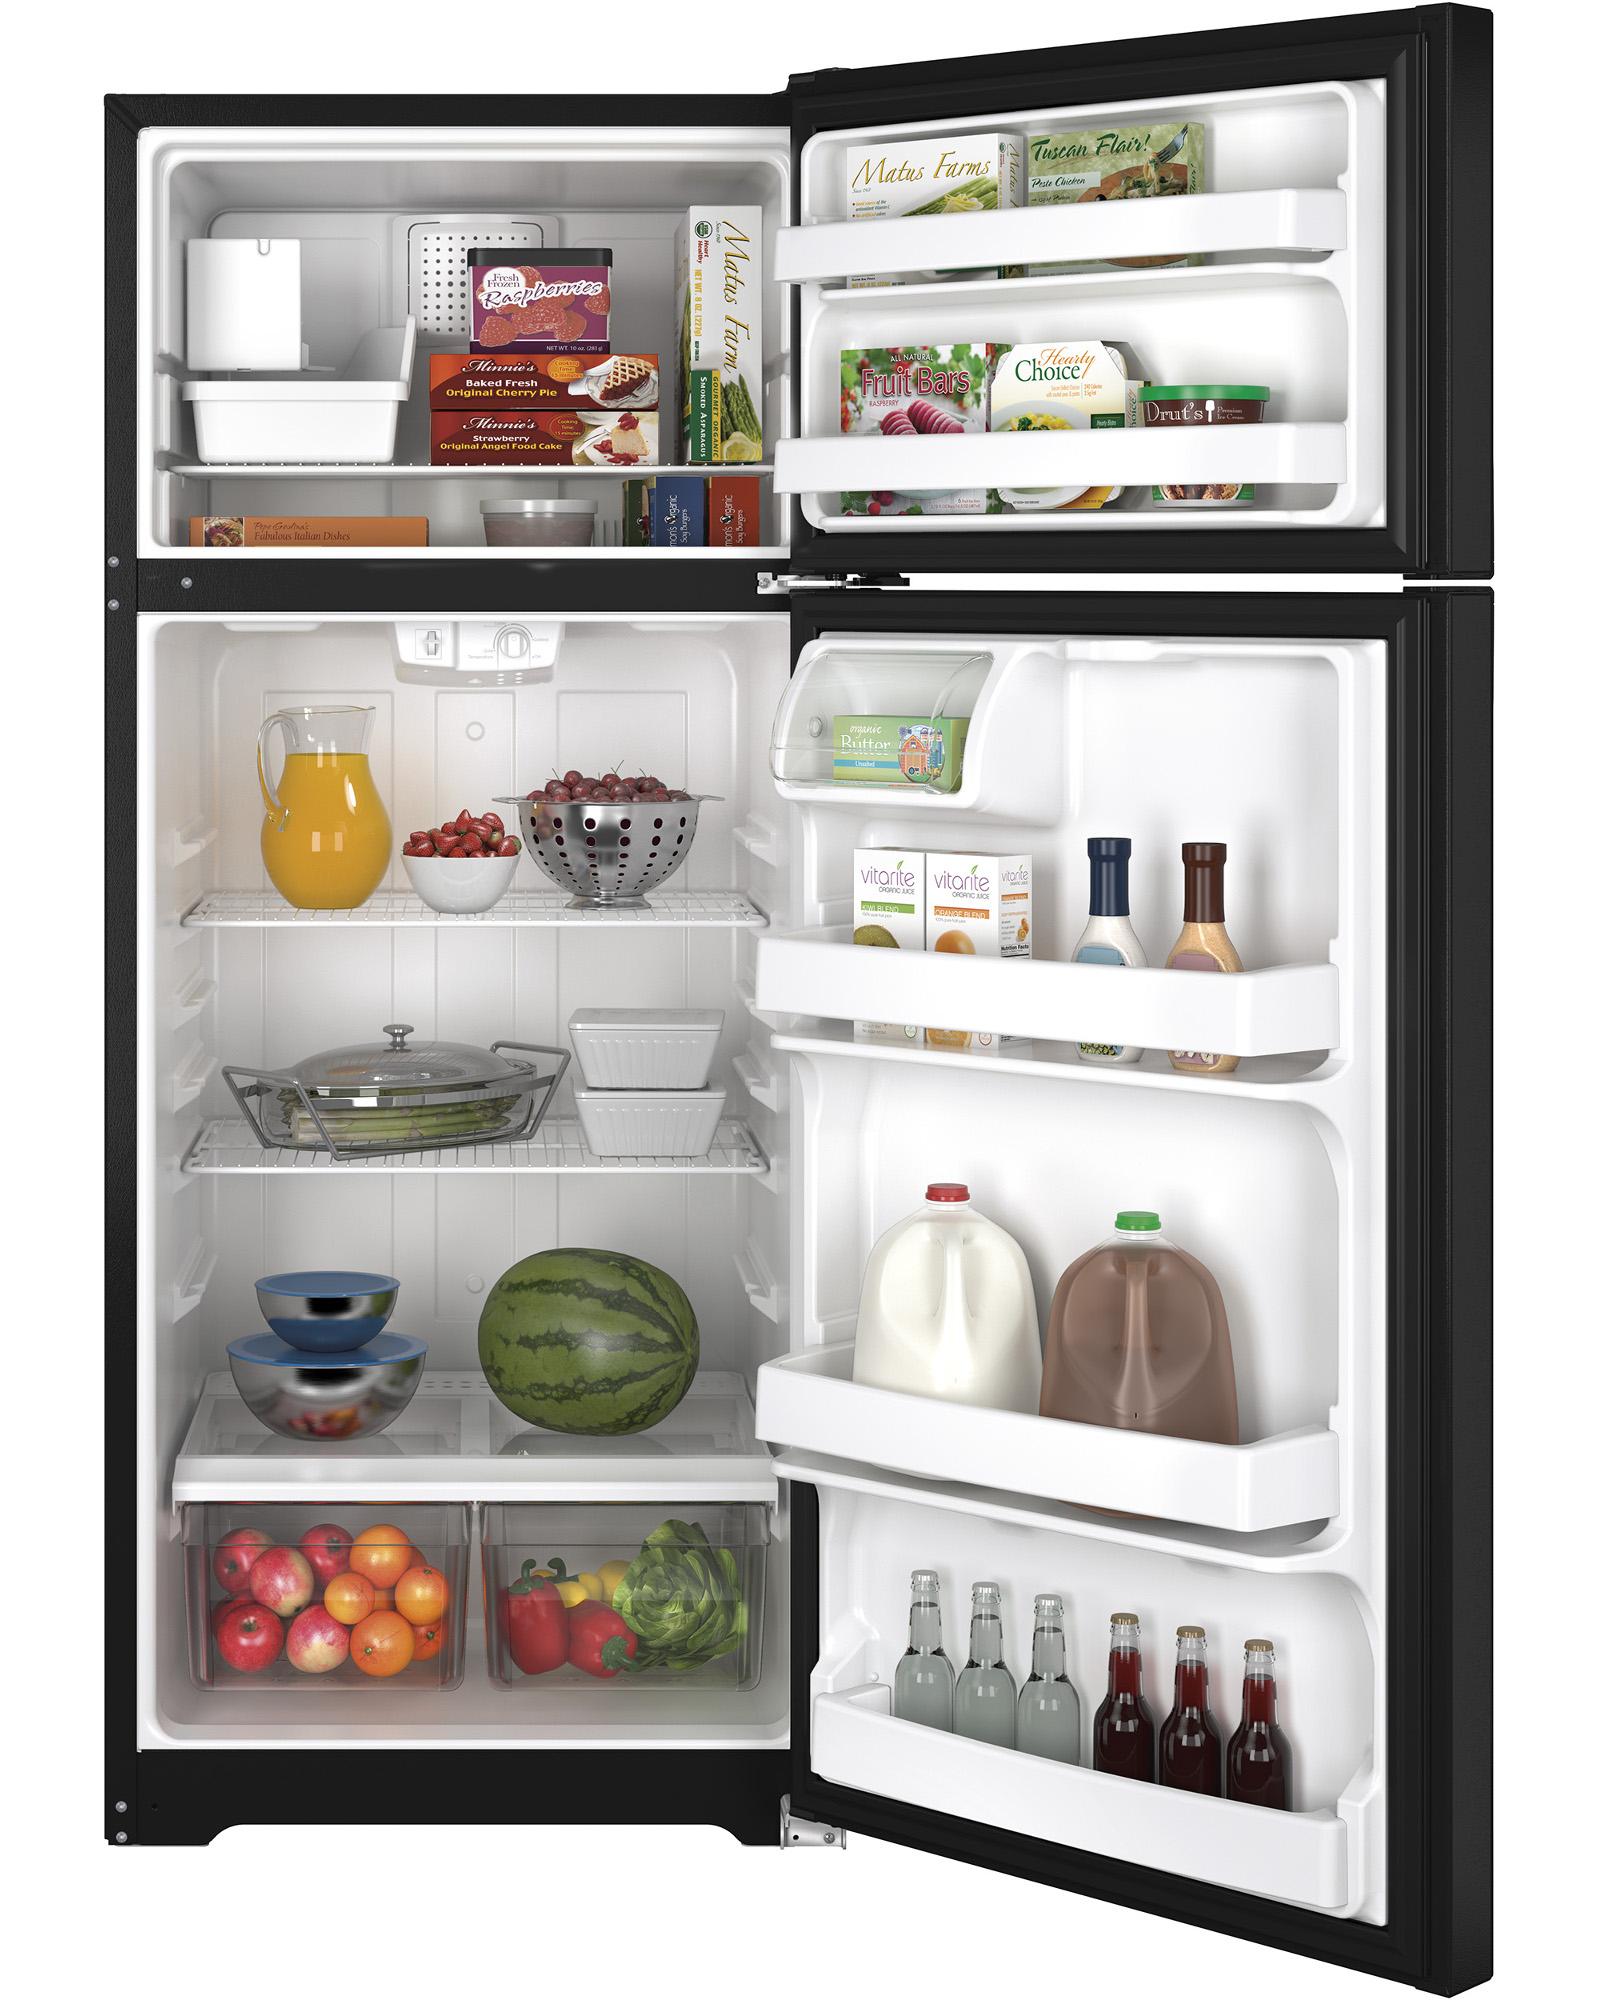 GE Appliances GIE18CTHBB 17.5 cu. ft. Top-Freezer Refrigerator - Black